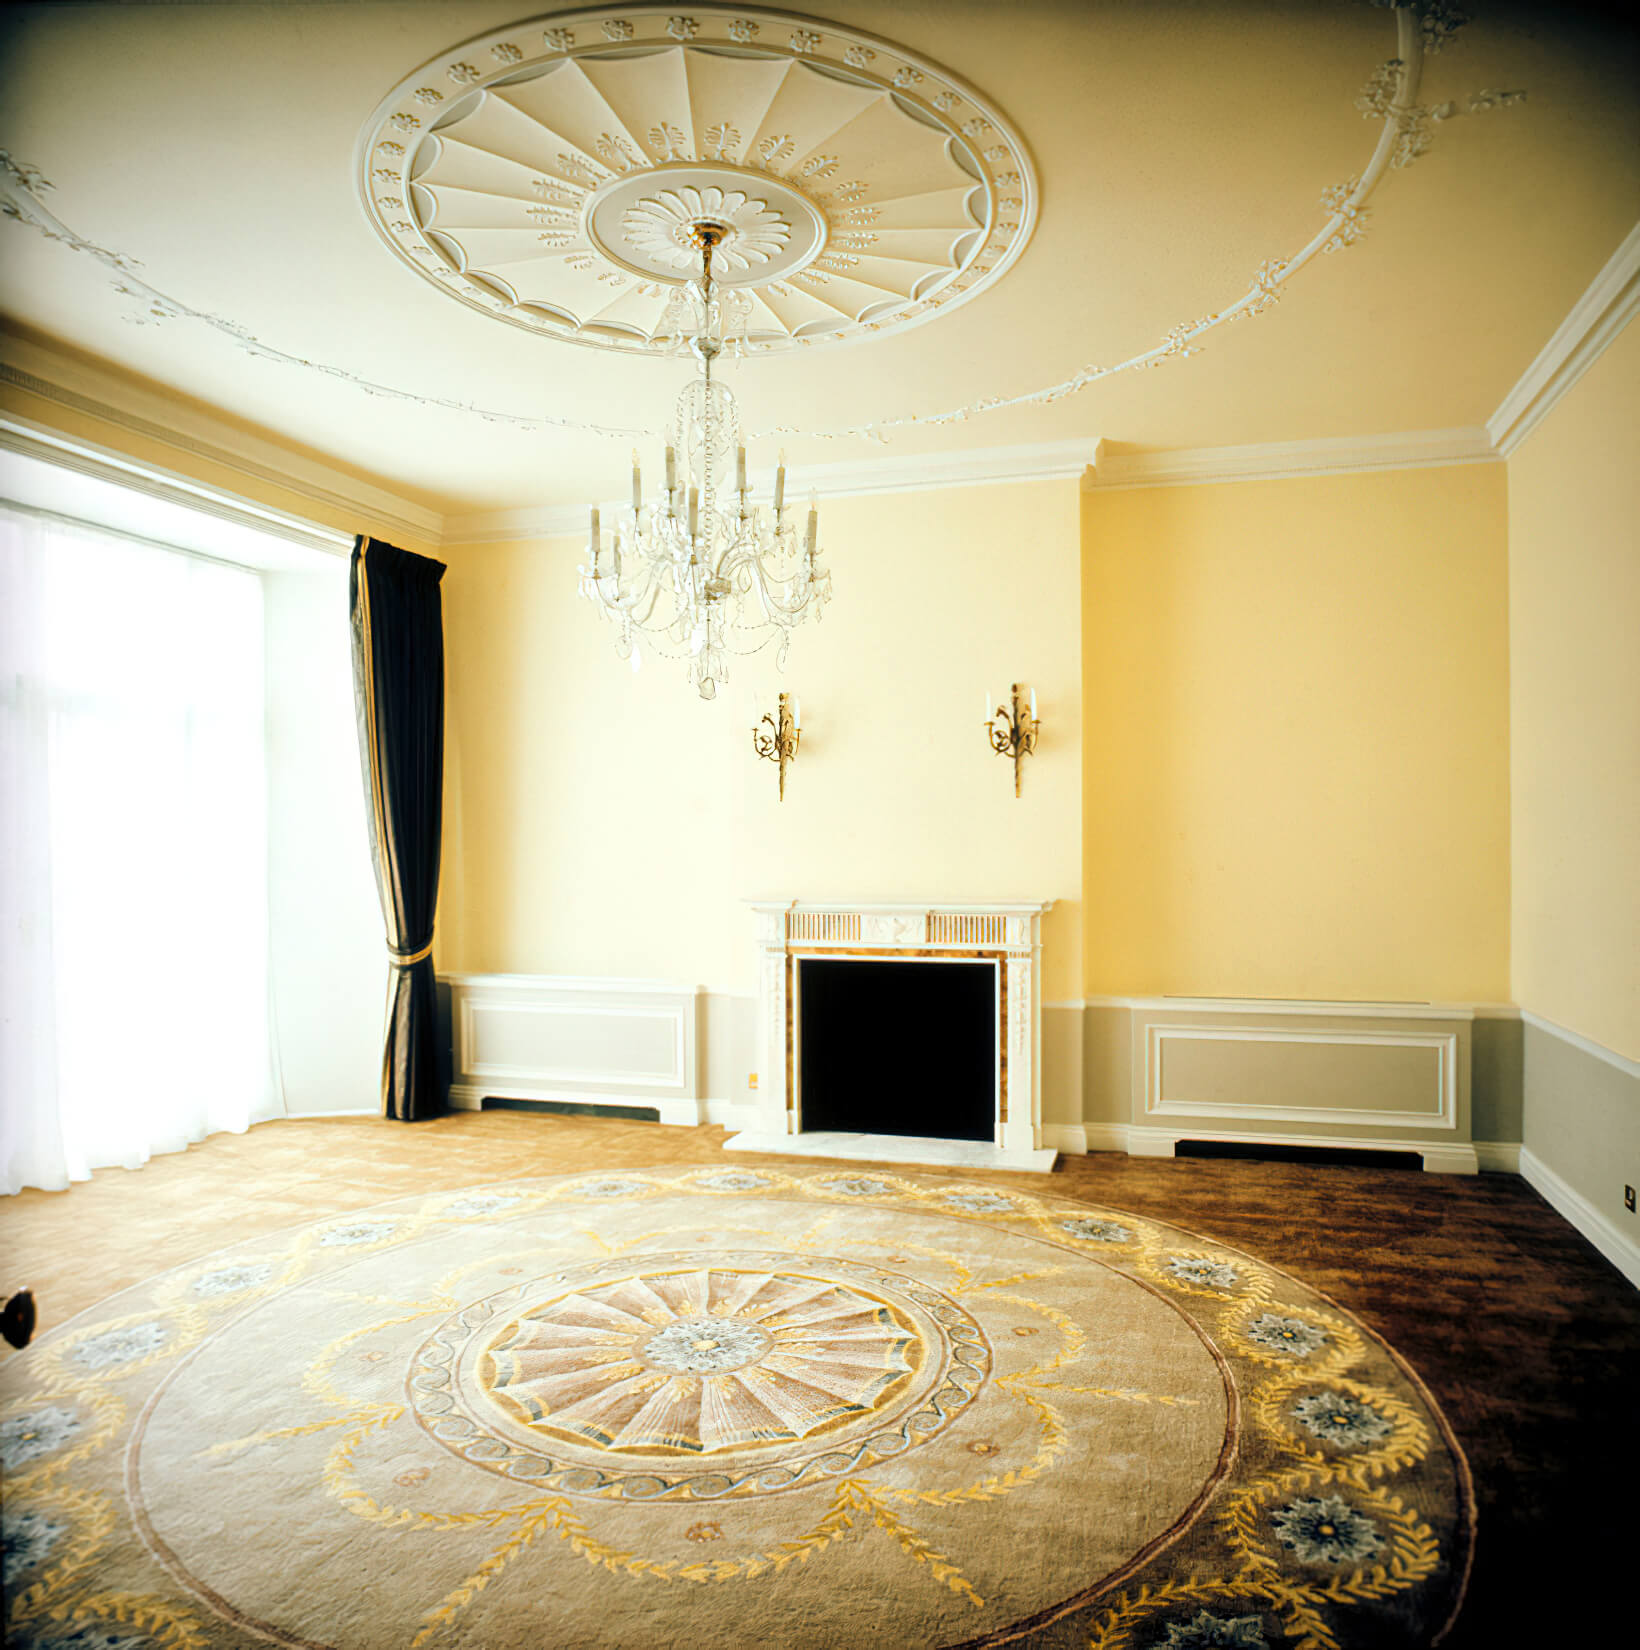 Carpet Design Reproduction